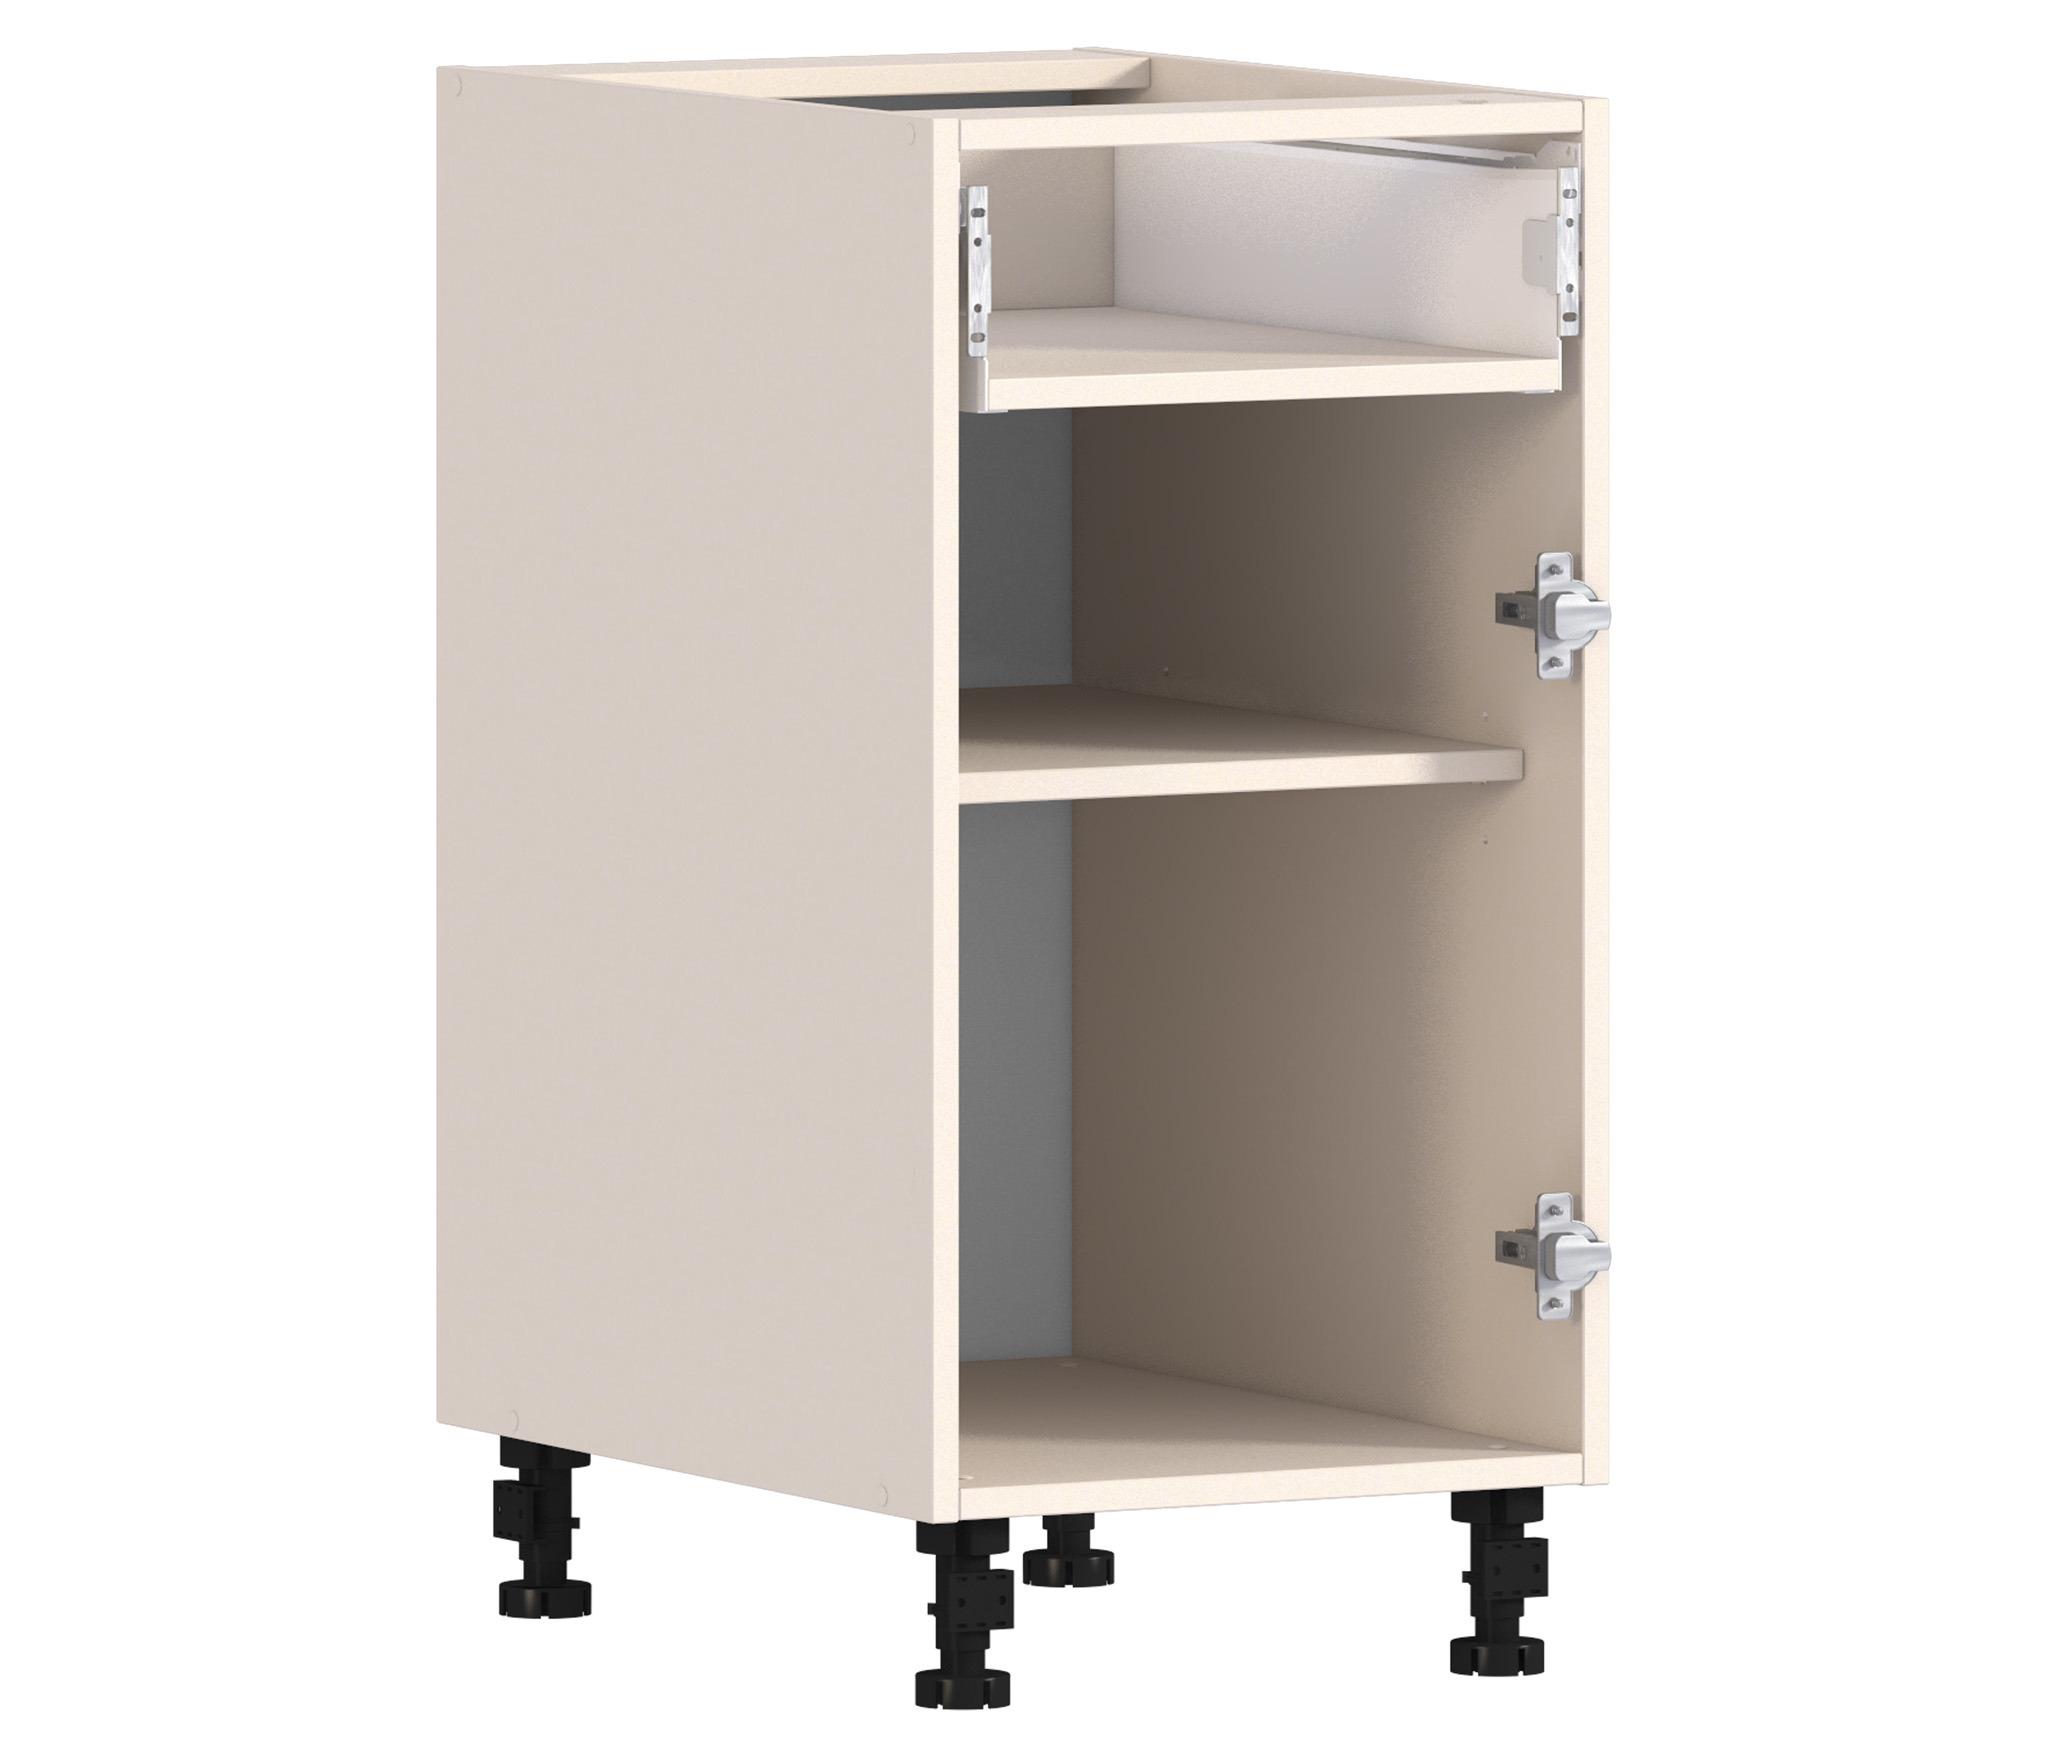 Регина РСДЯ-40 Шкаф-Стол 400Мебель для кухни<br>Практичный шкаф для  кухни.<br><br>Длина мм: 400<br>Высота мм: 820<br>Глубина мм: 564